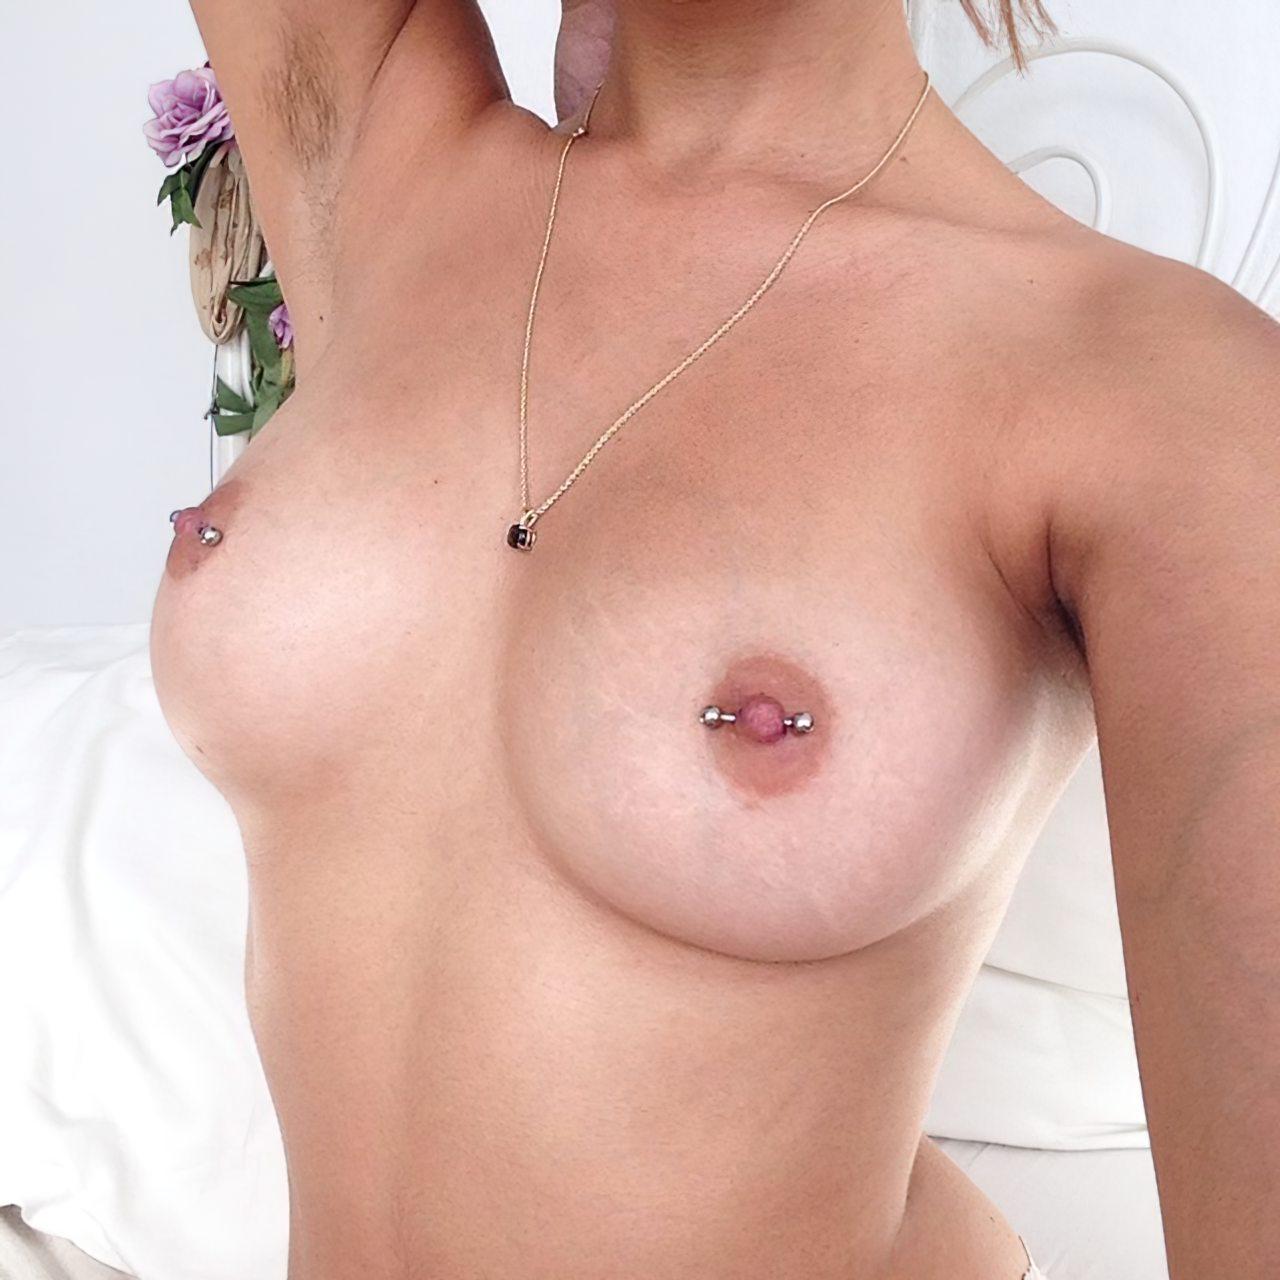 Mulher Nua (42)